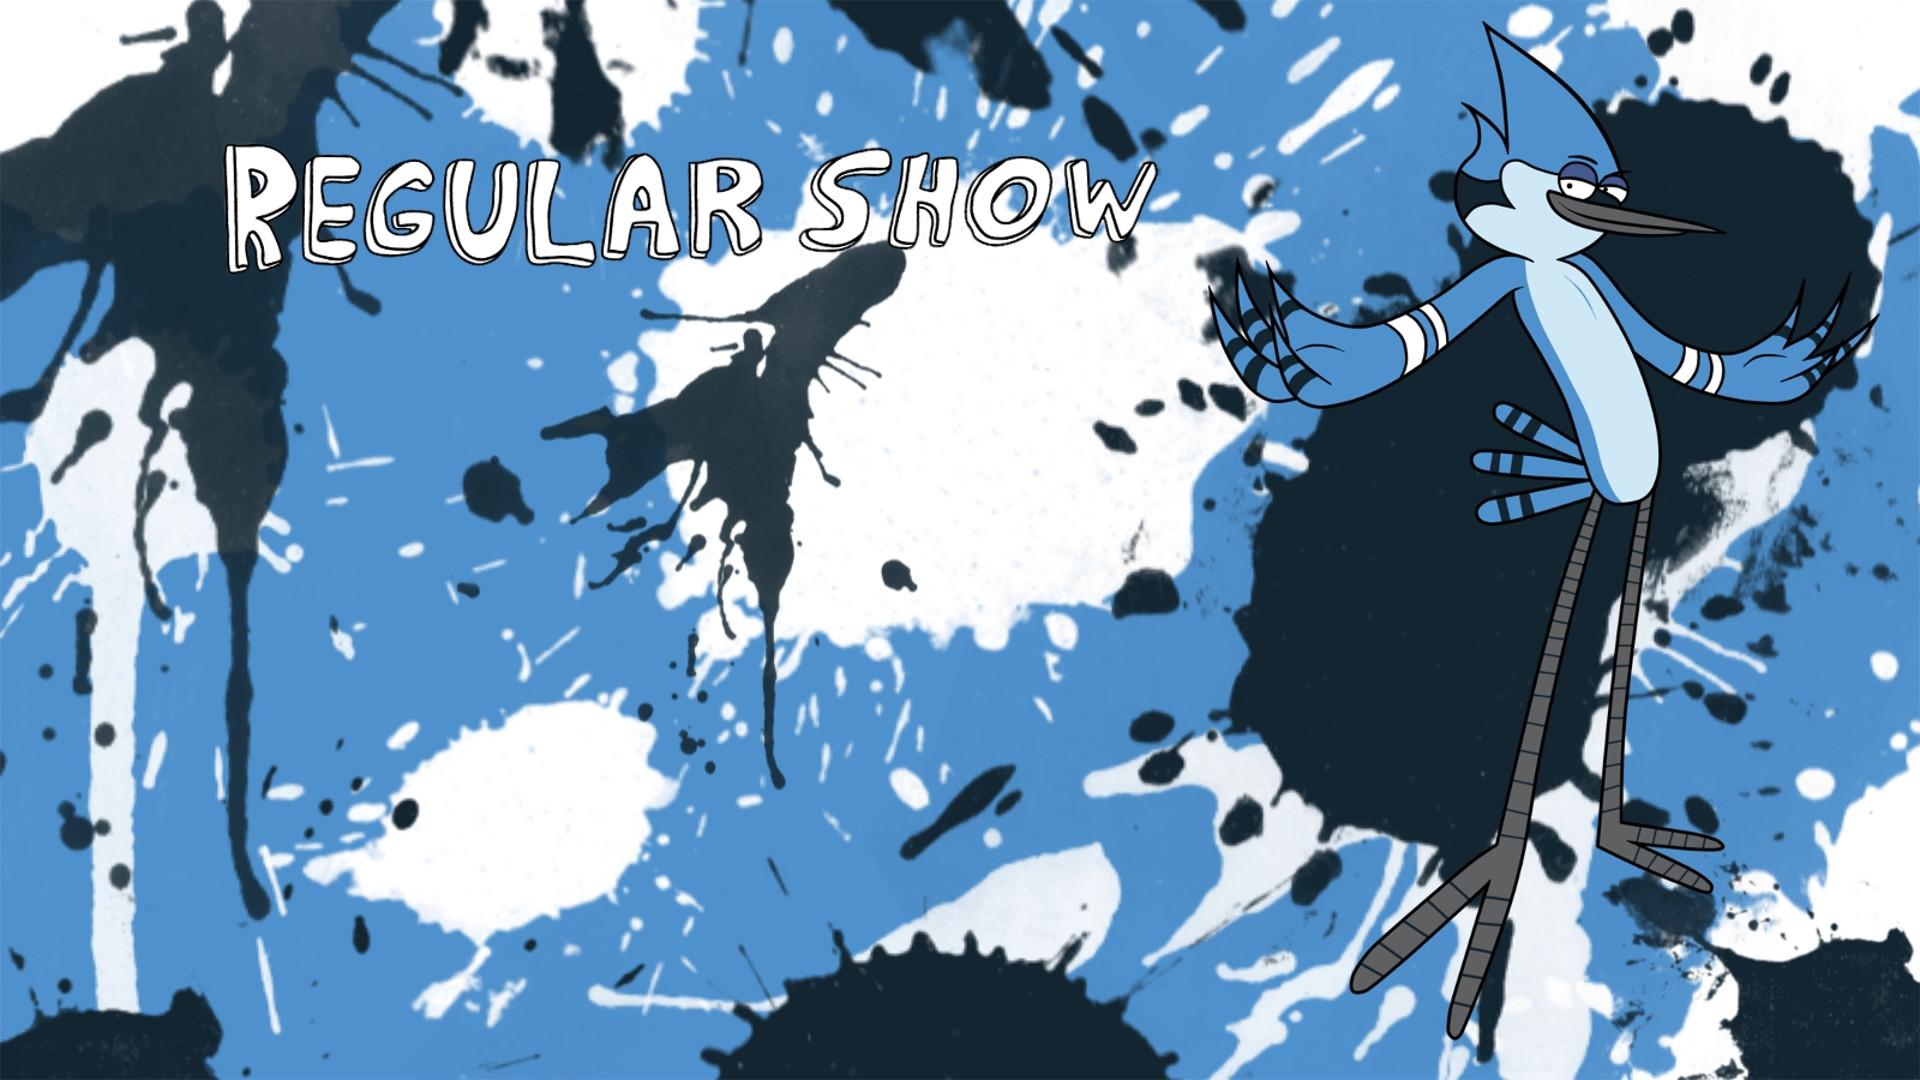 The Regular Show Wallpaper ① Wallpapertag